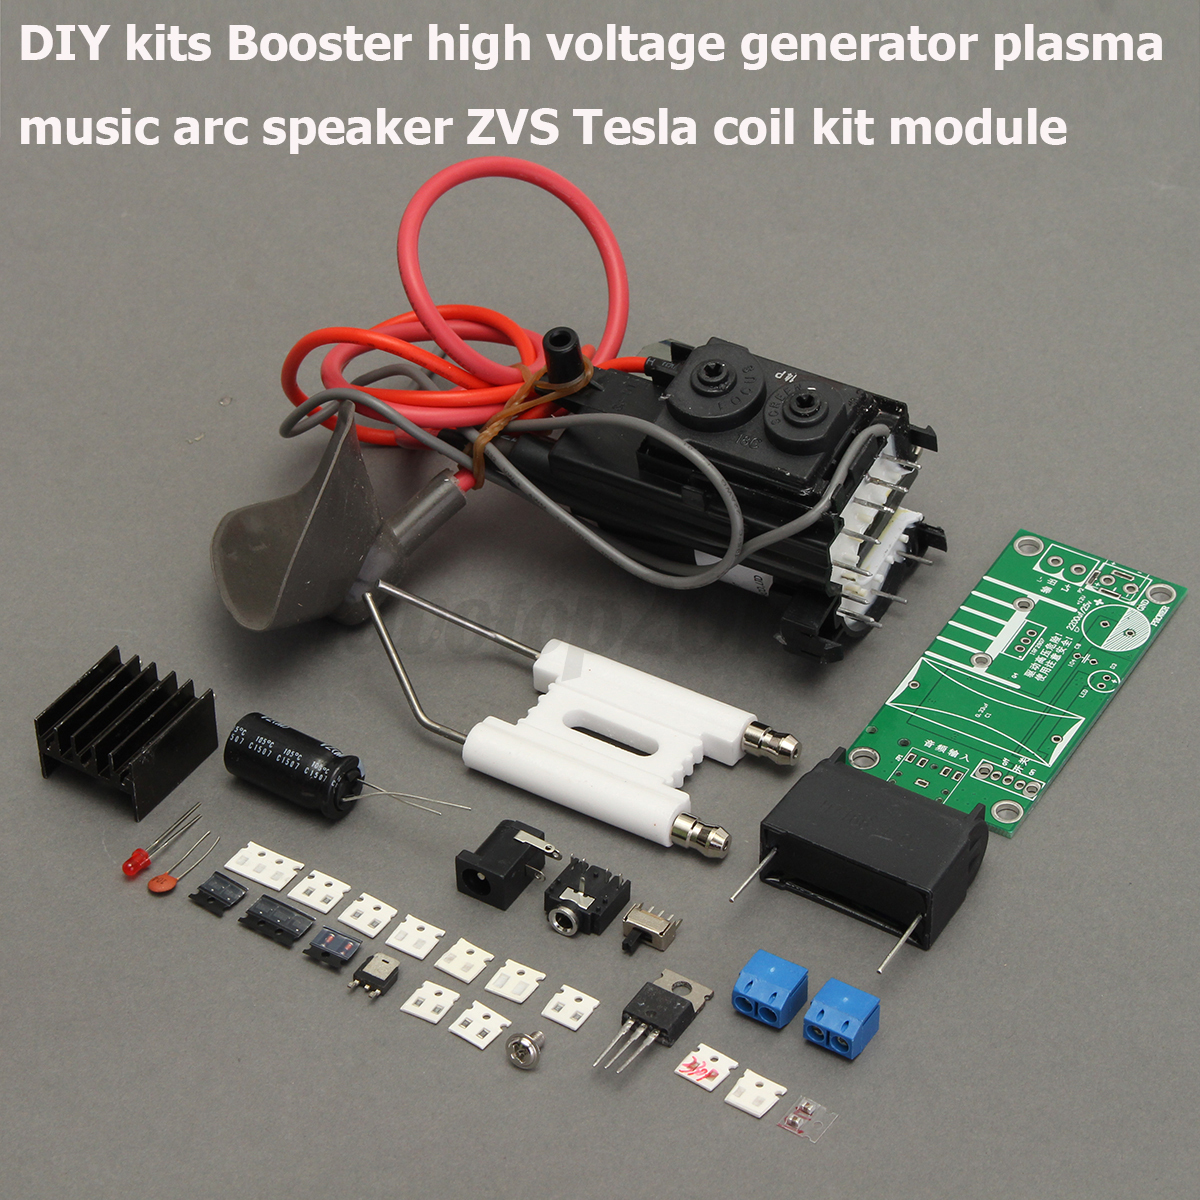 High Voltage Plasma : Kv tesla coil zvs booster high voltage generator plasma